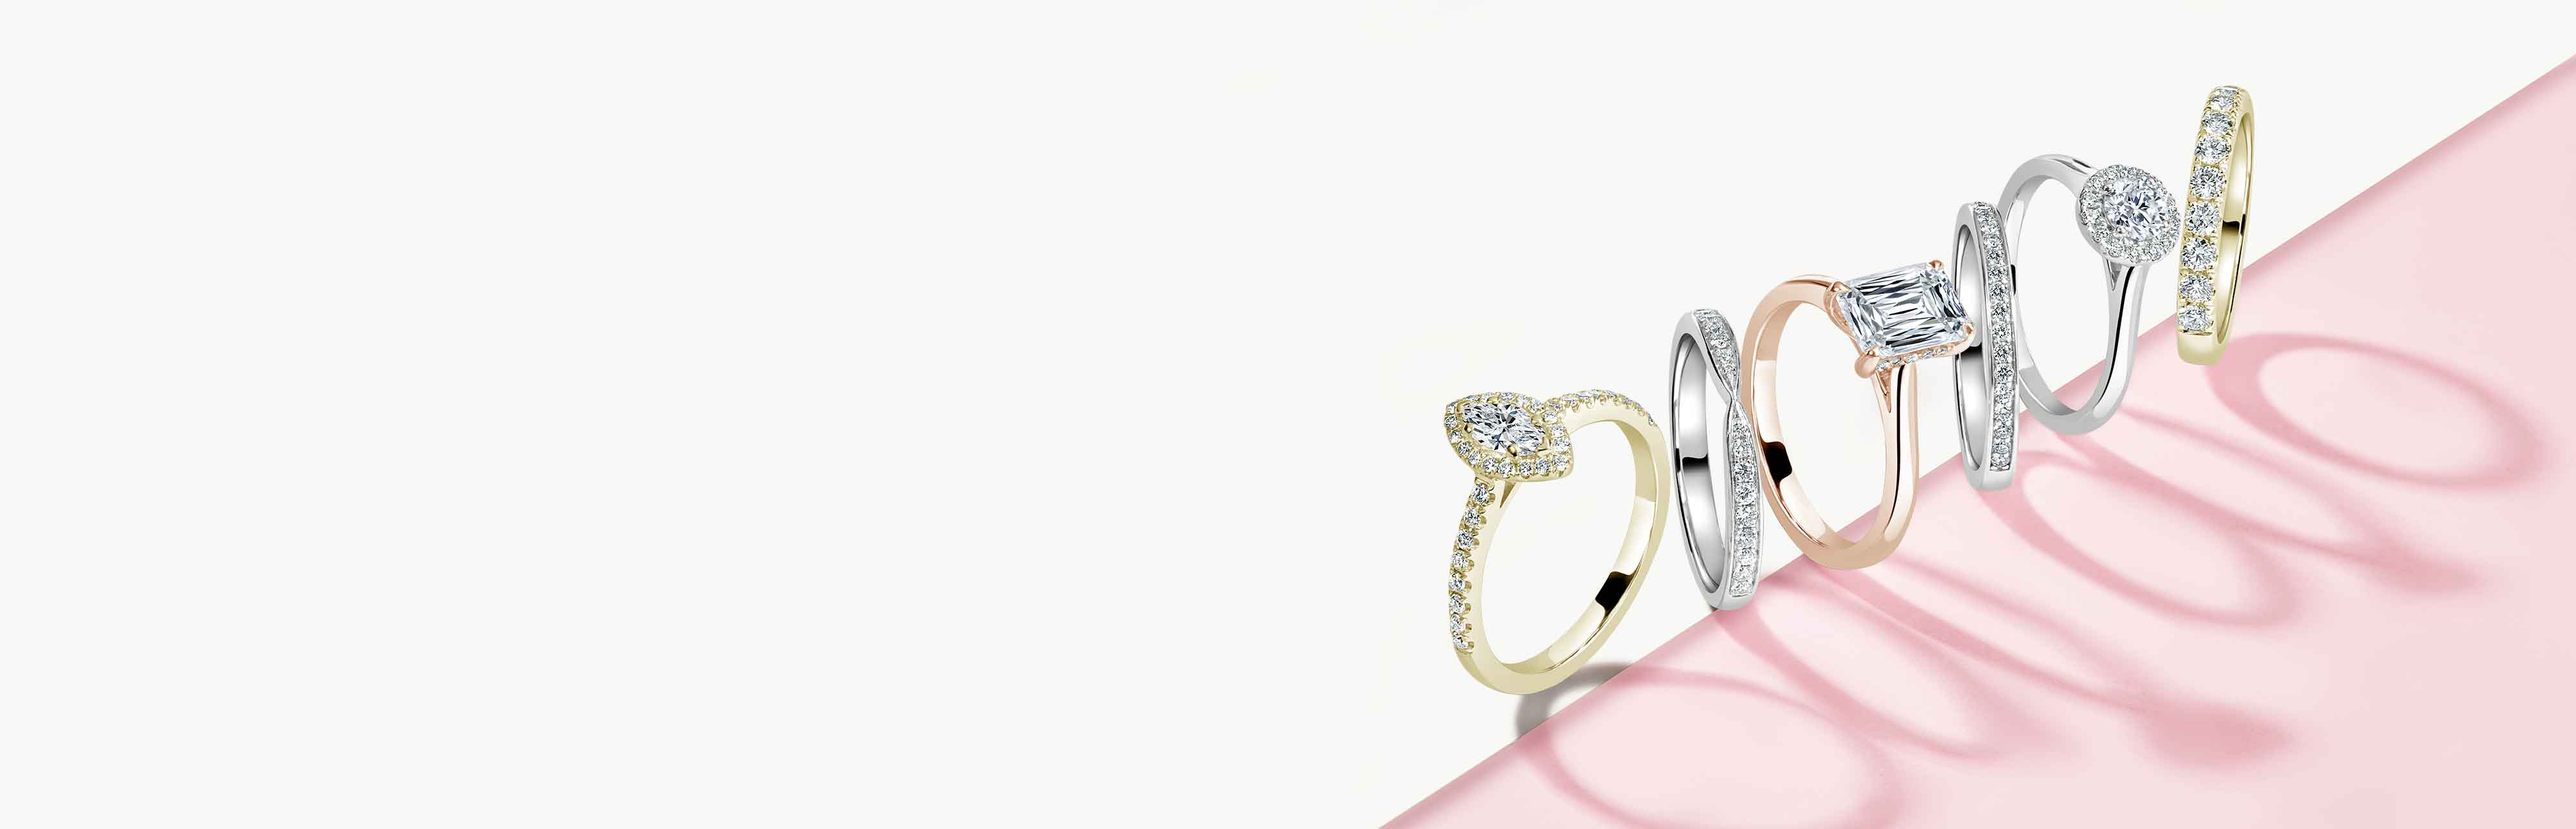 Round Brilliant Diamond Engagement Rings